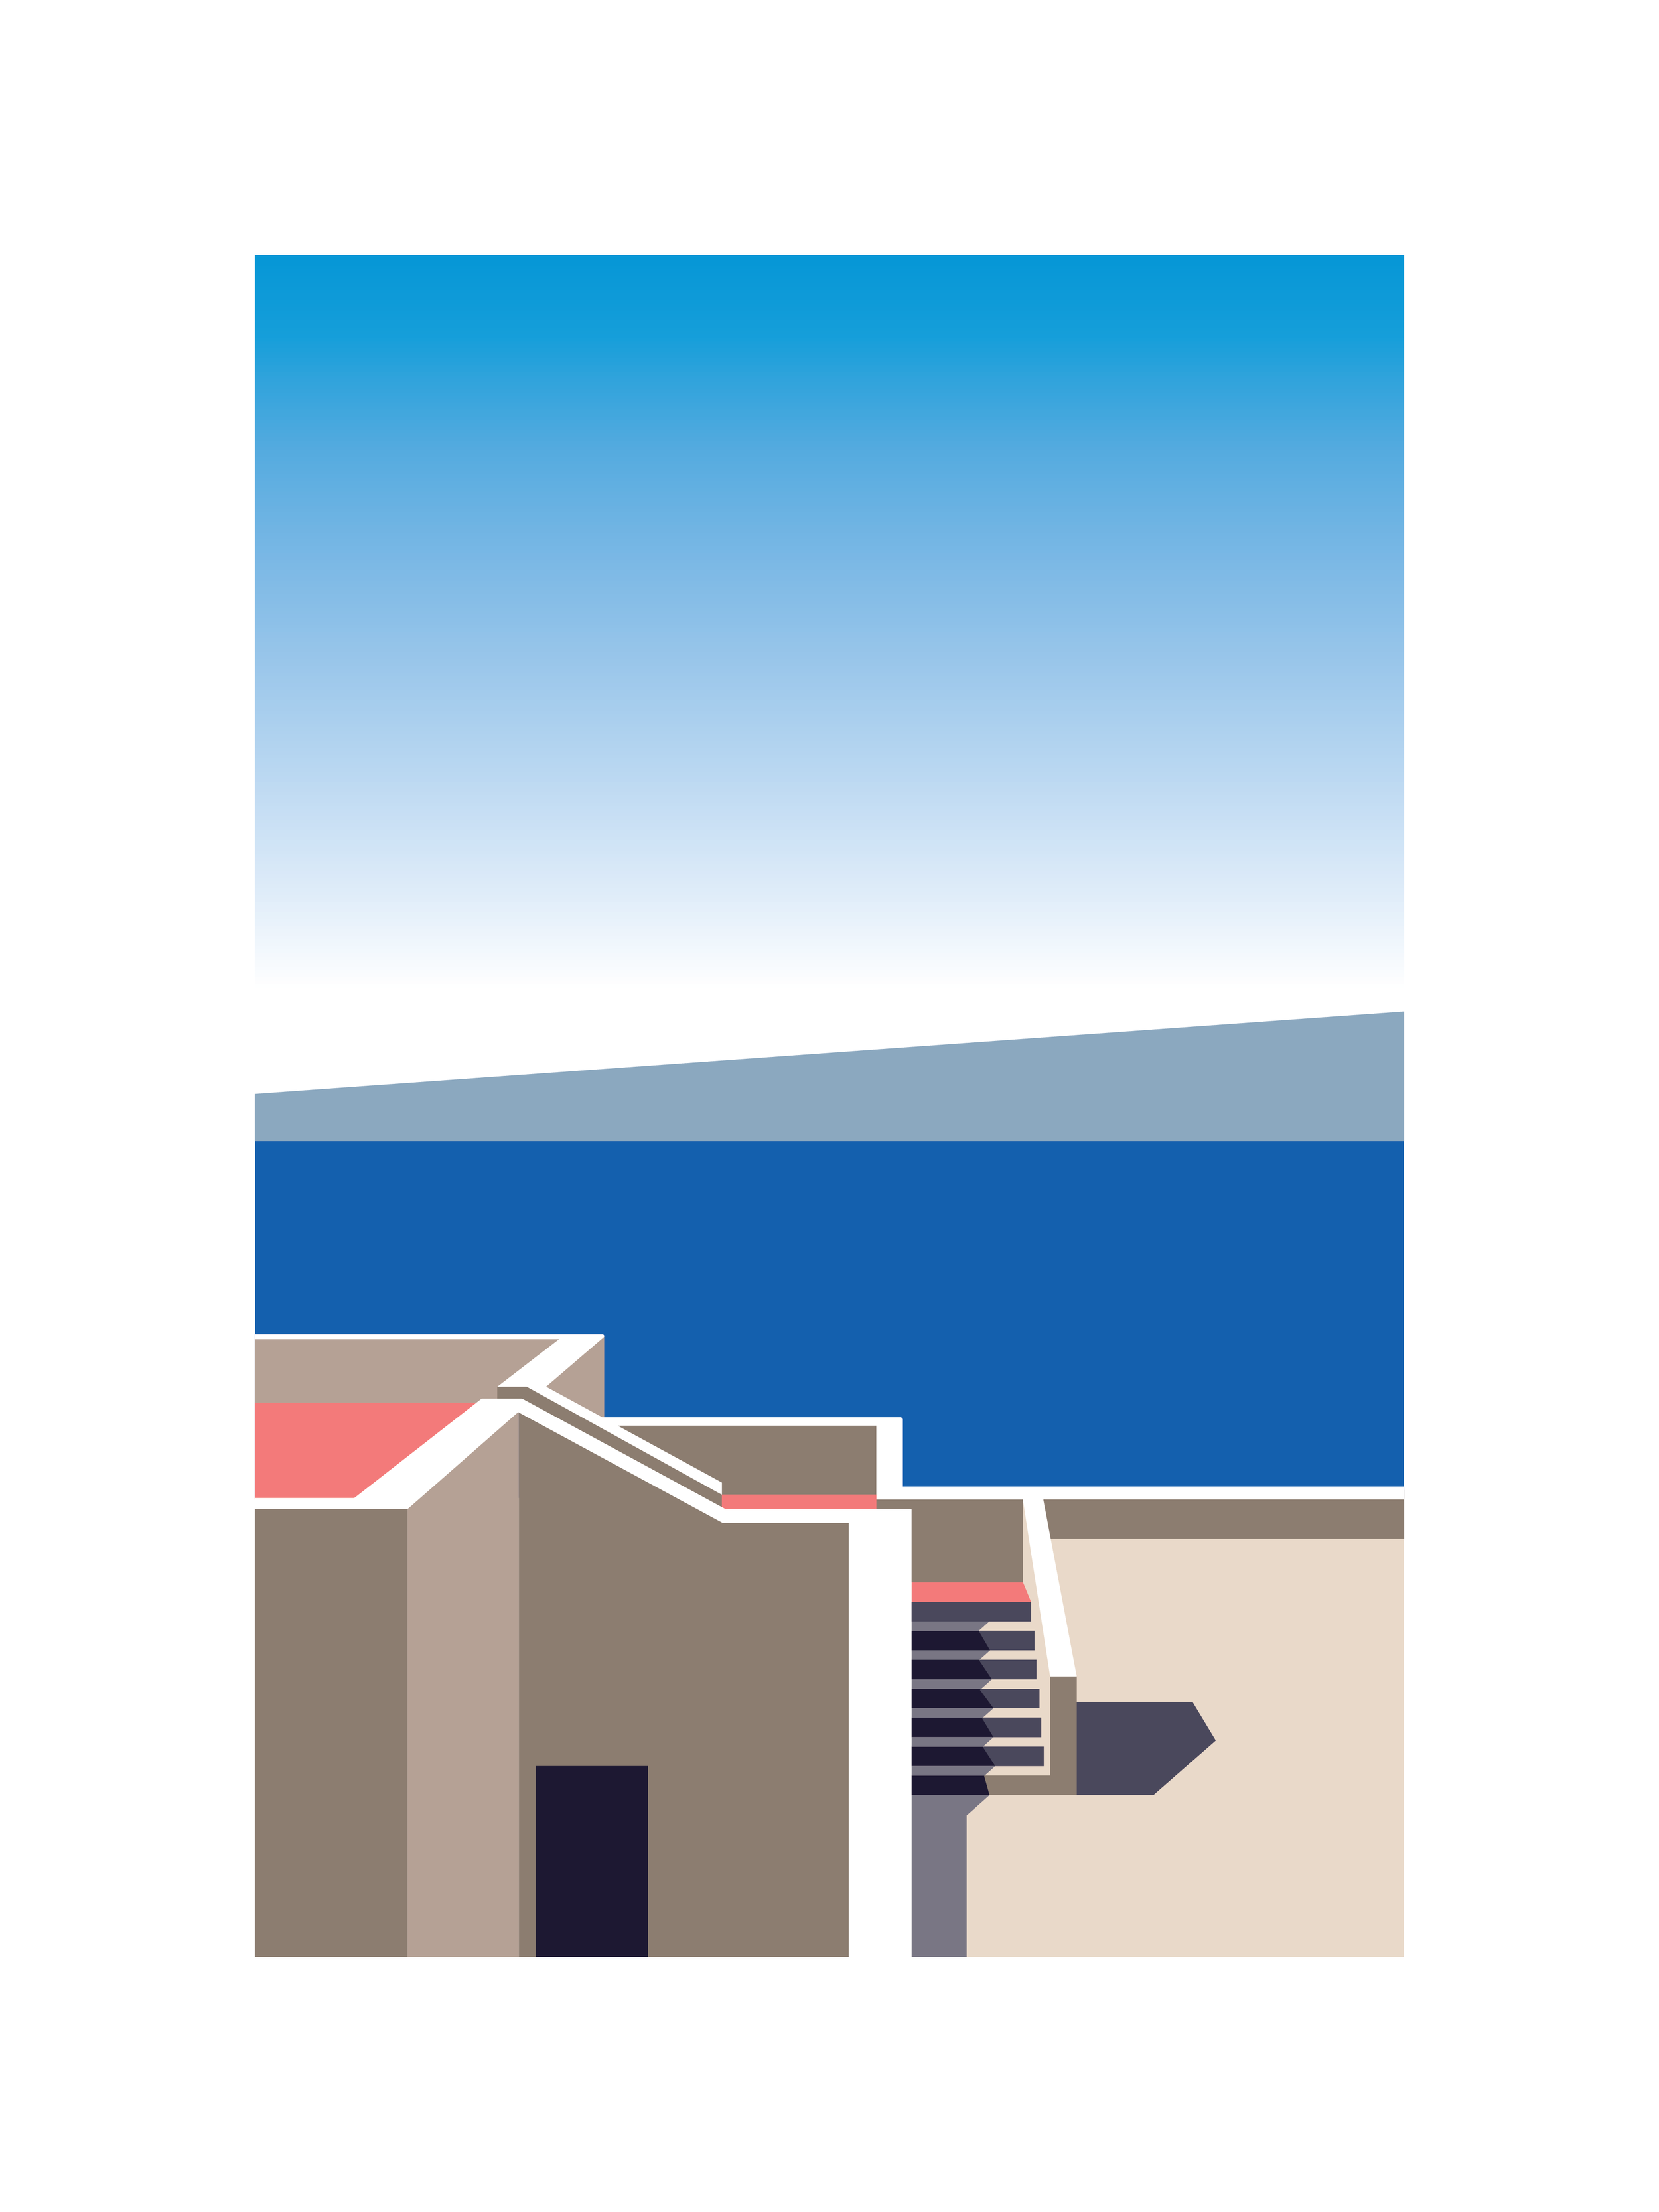 Carreras_x_Napoli-10.png